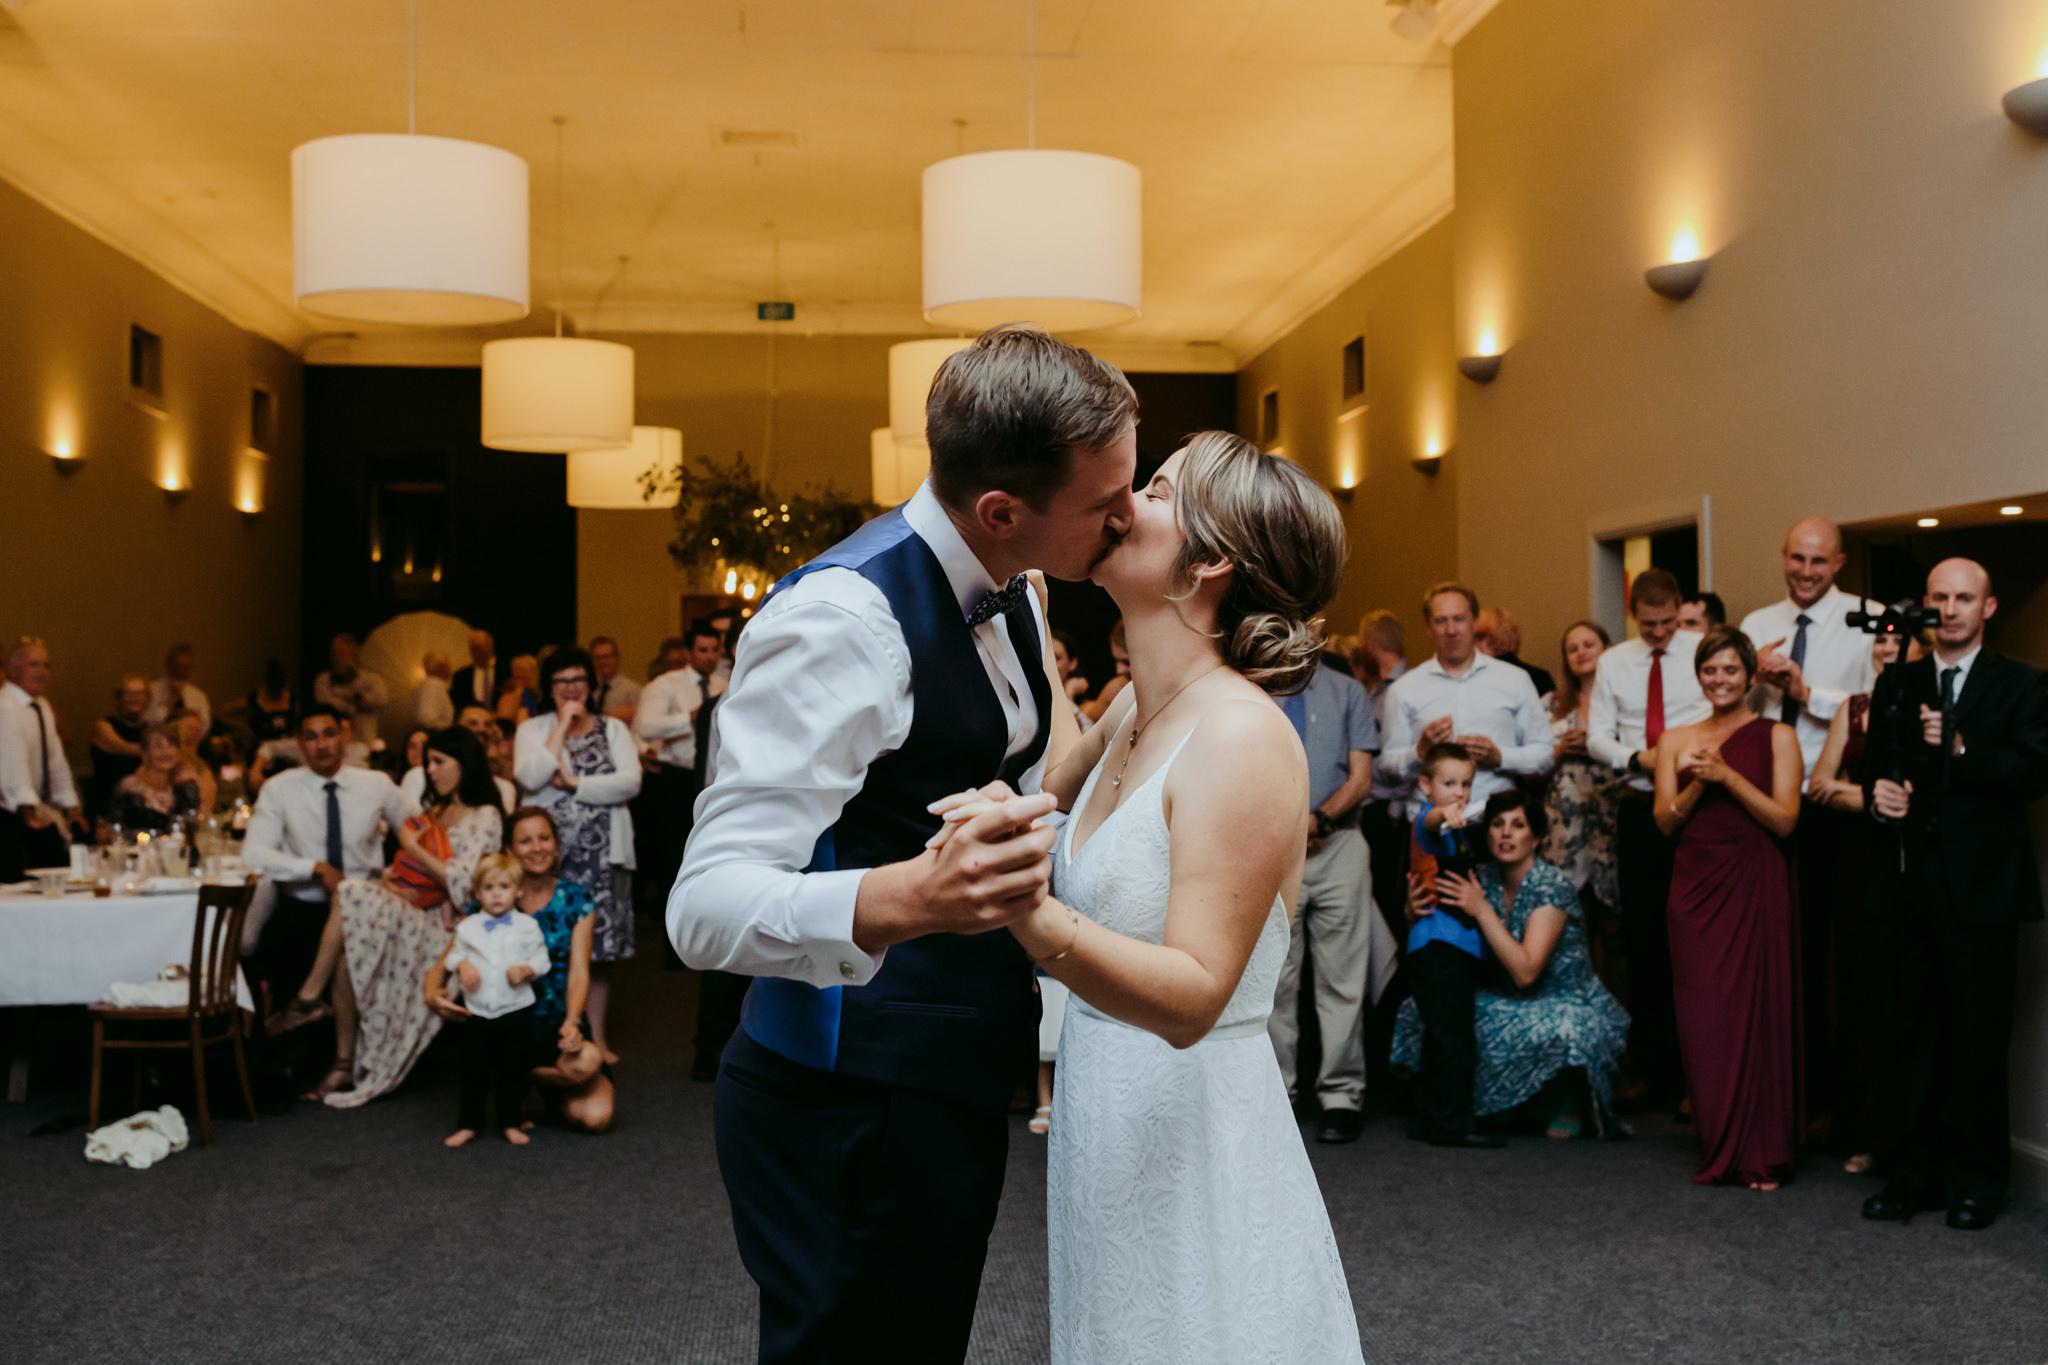 Erin Latimore Mudgee Canberra Wedding Photographer ROSEBANK GUESTHOUSE OLD THEATRE TONIC MILLTHORPE_799.JPG